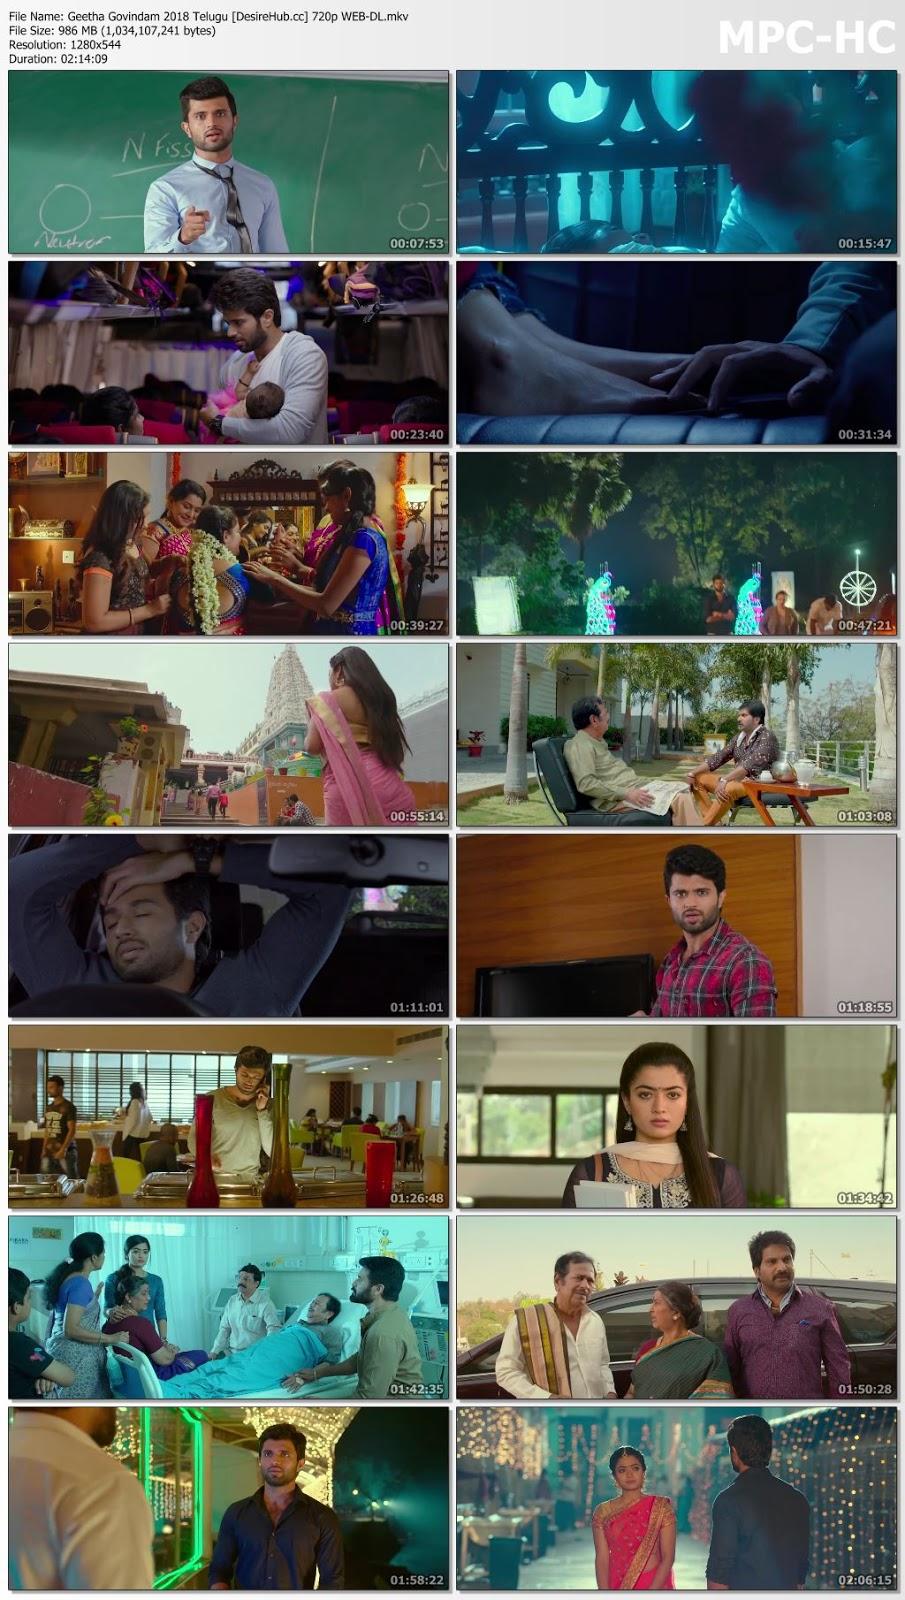 Geetha Govindam 2018 Telugu 480p WEB-DL ESubs 350MB Desirehub